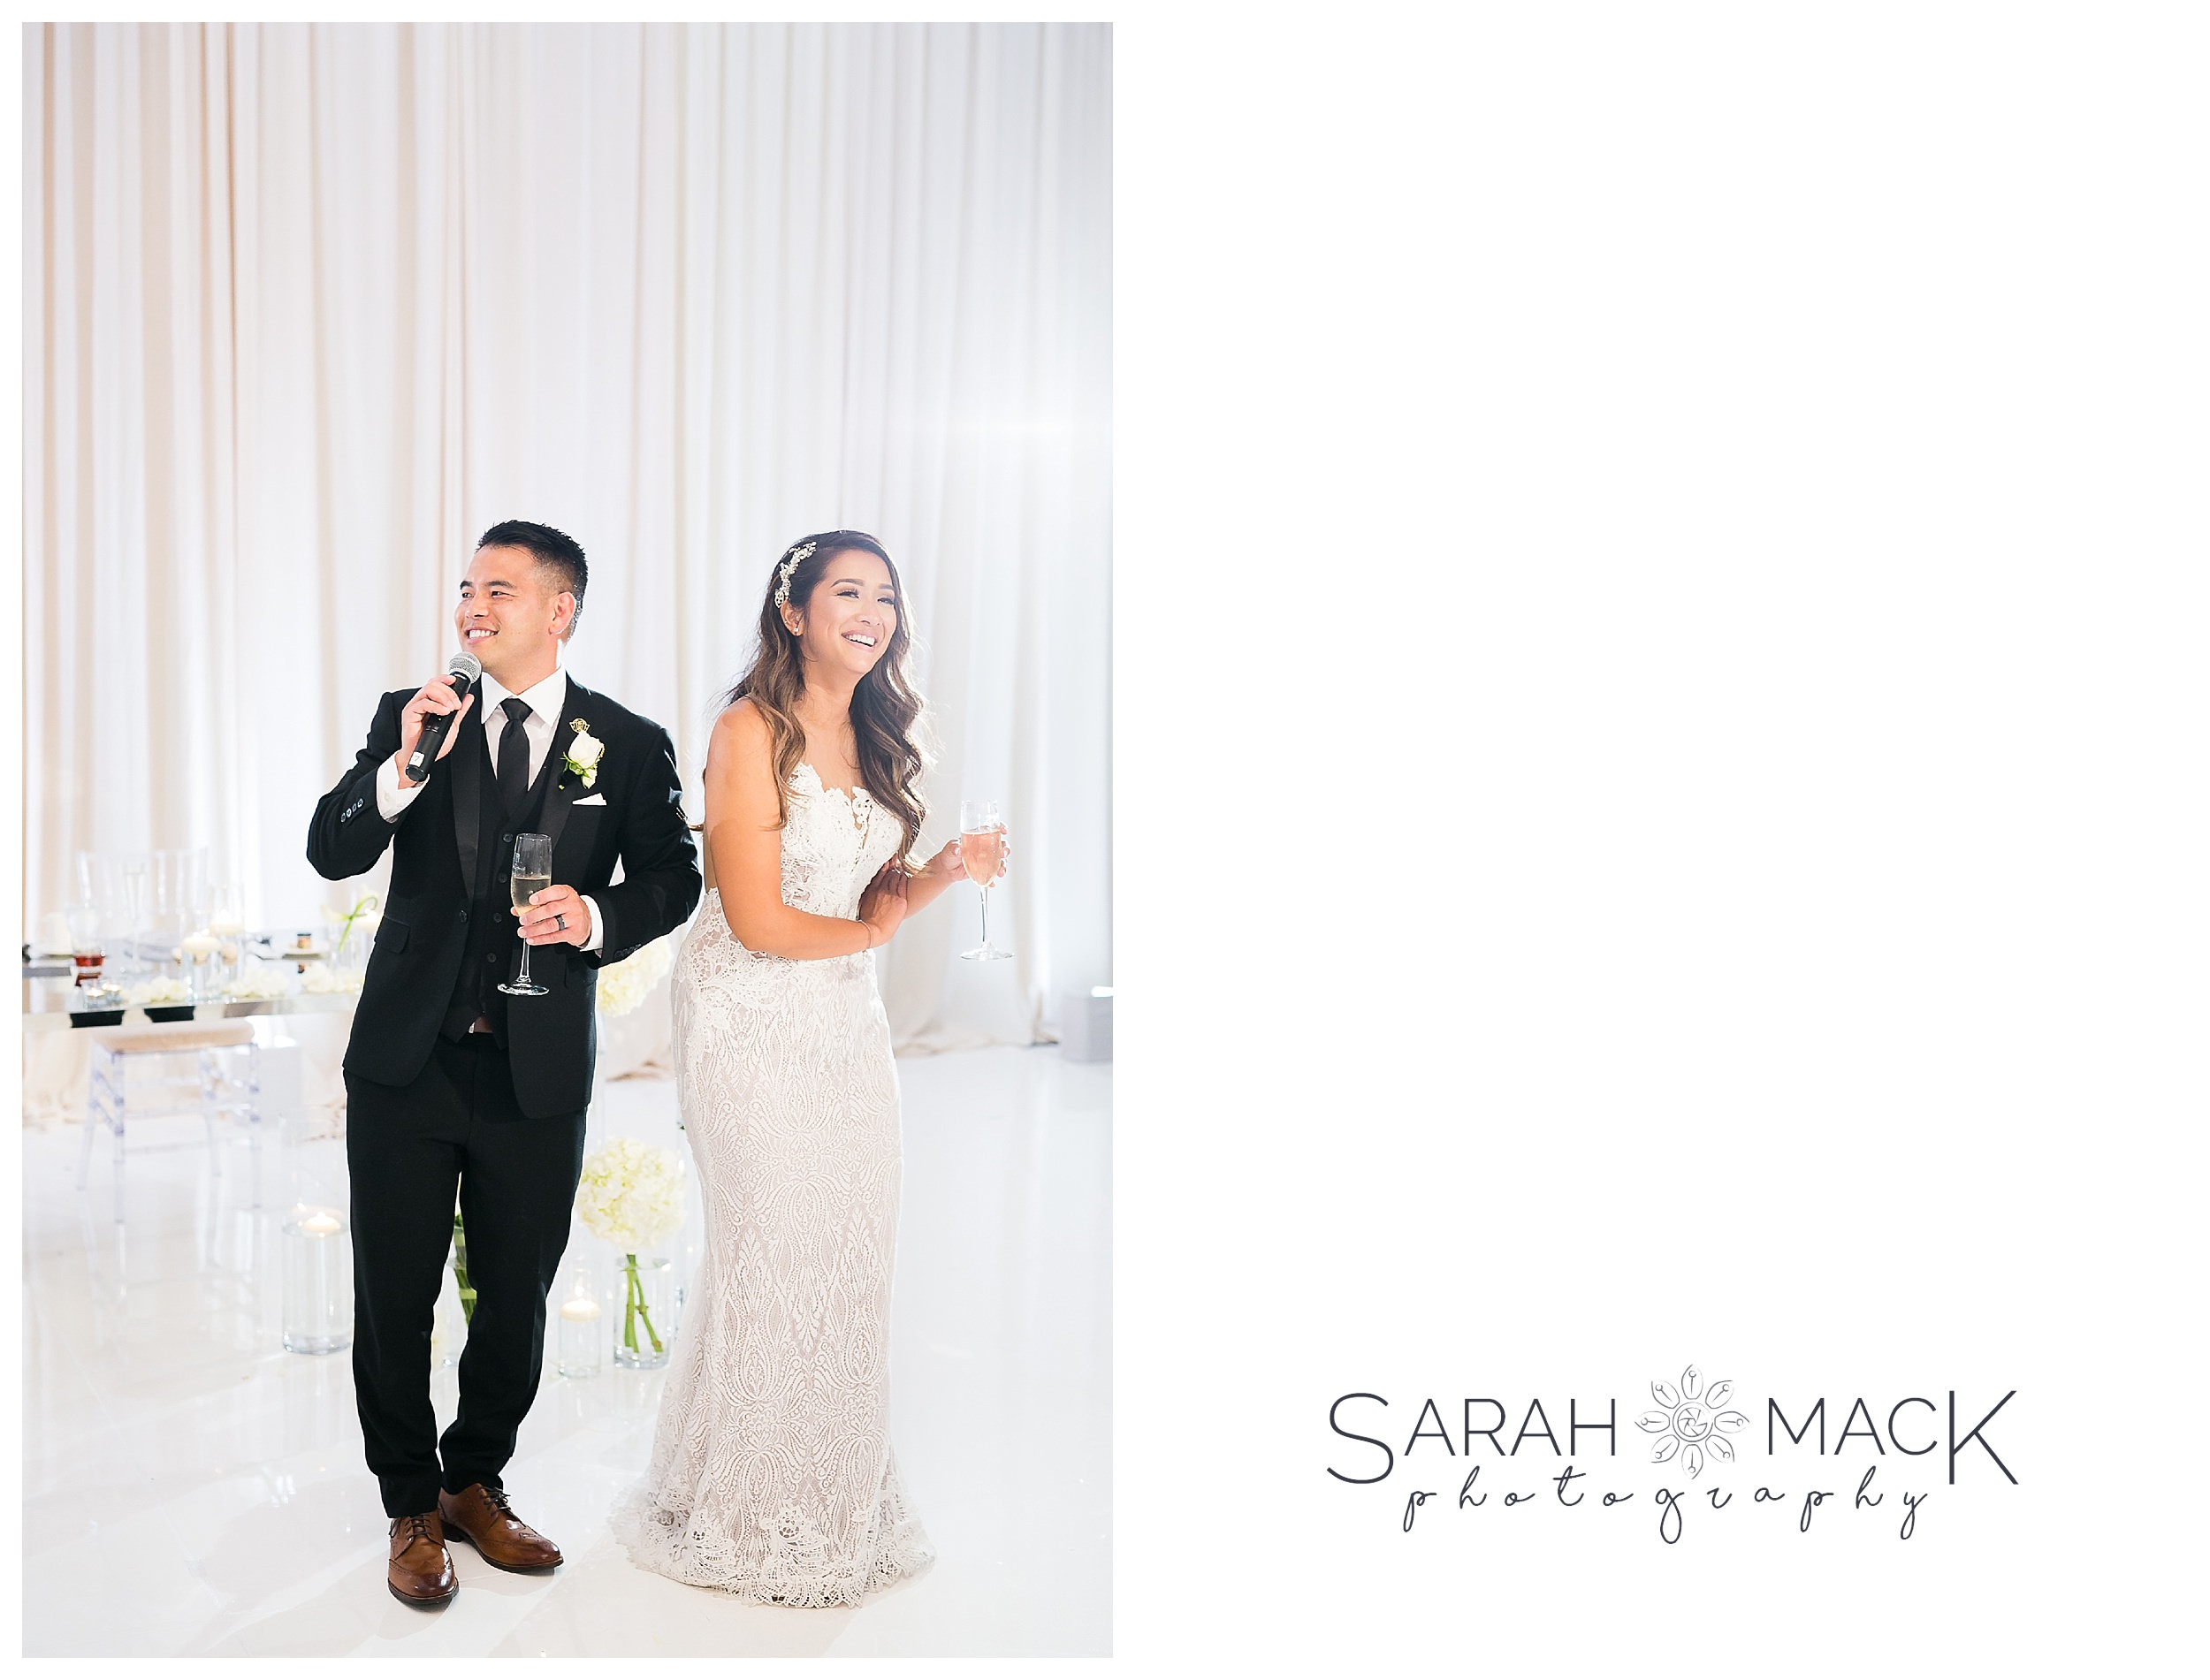 LE-Avenue-of-the-Arts-Costa-Mesa-Wedding-Photography-0209.jpg